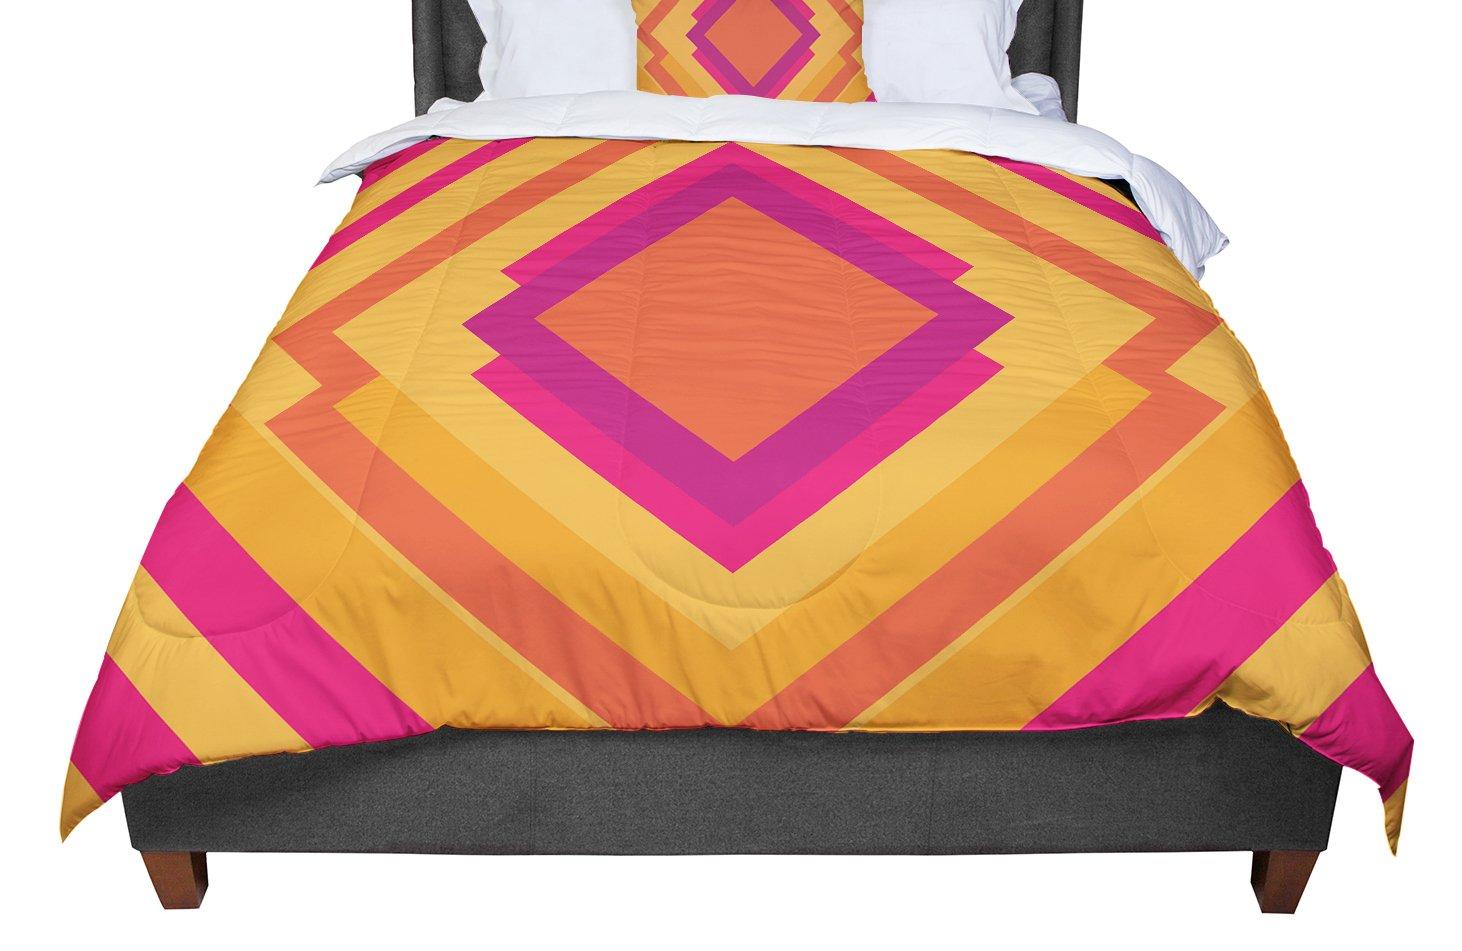 Cal King Comforter KESS InHouse Nick Atkinson Skull King 104 X 88